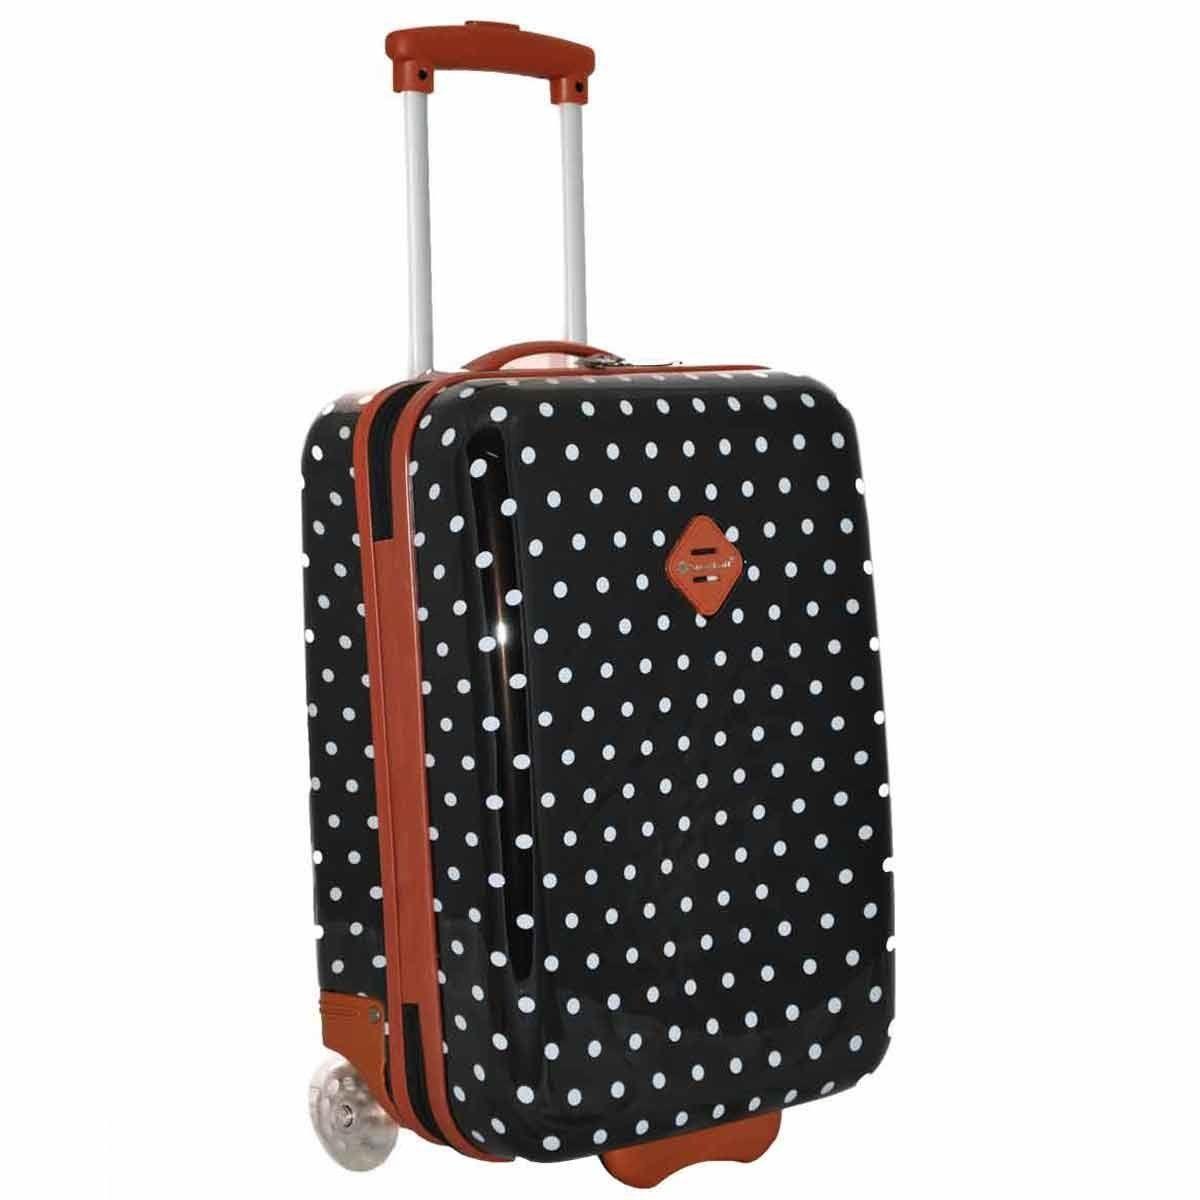 f4619a1bdc2f Snowball Children's Luggage black black 52 x 34 x 19 cm   Hand ...